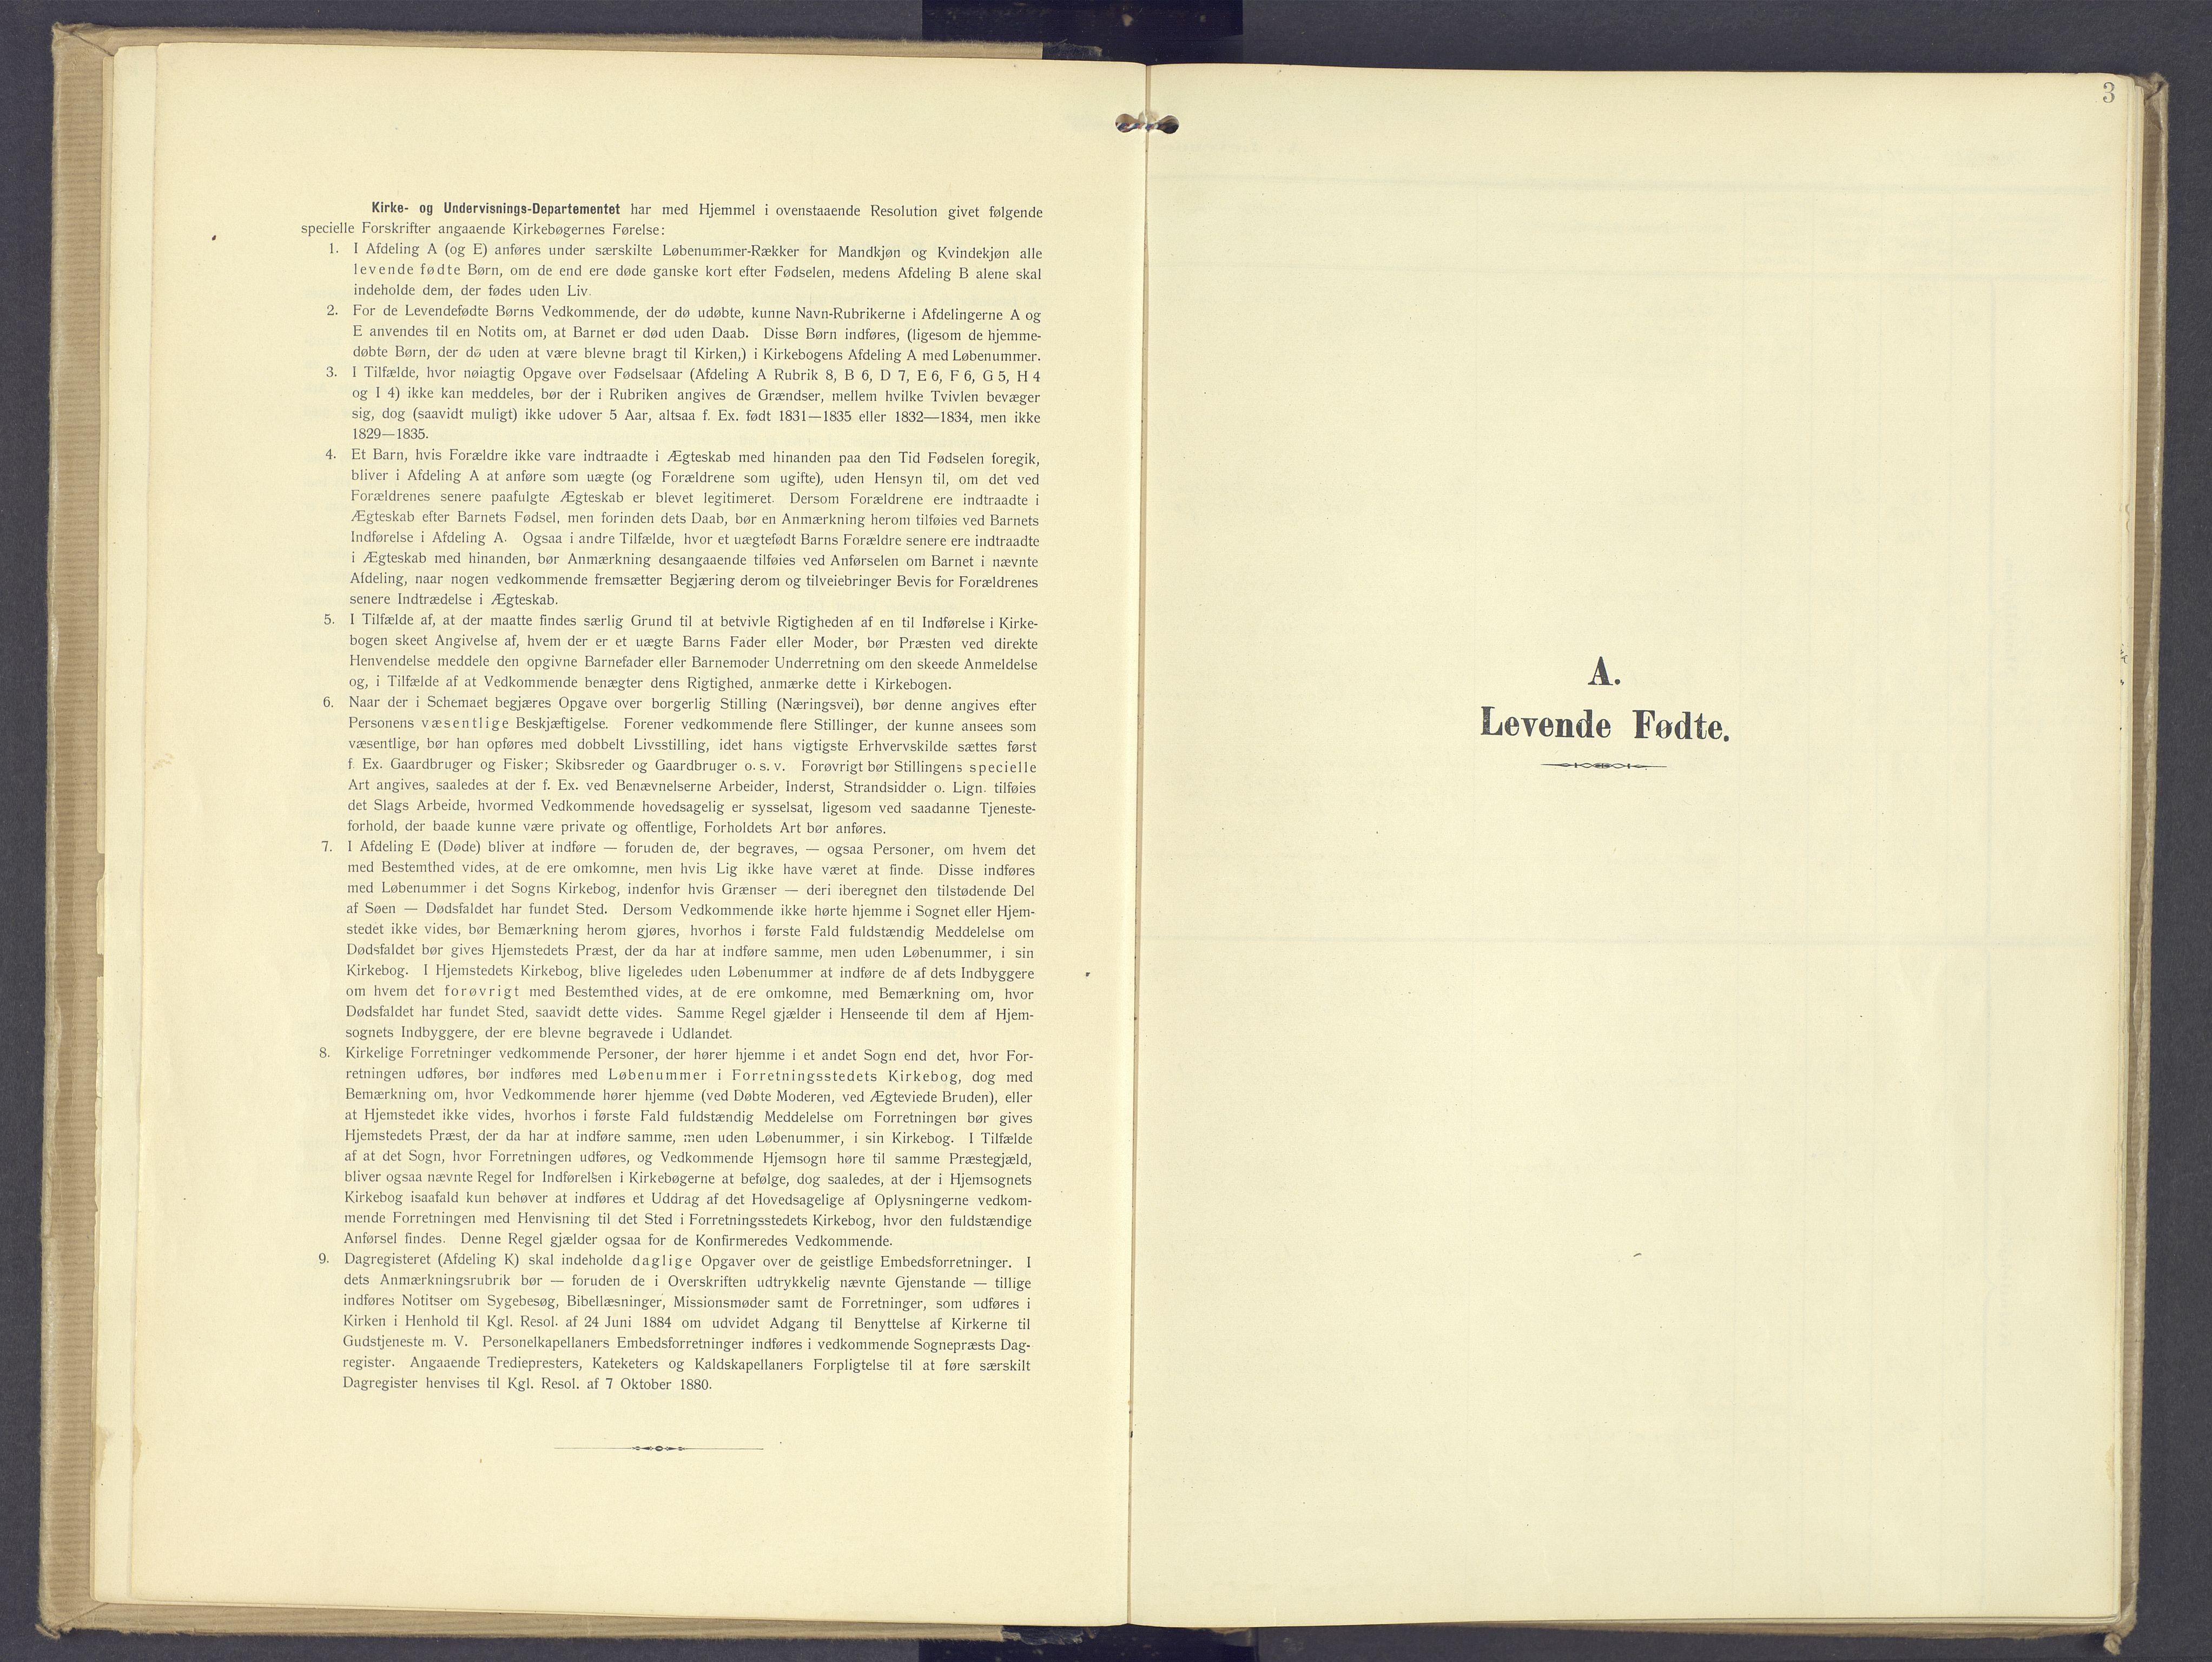 SAH, Øyer prestekontor, Ministerialbok nr. 13, 1905-1920, s. 3